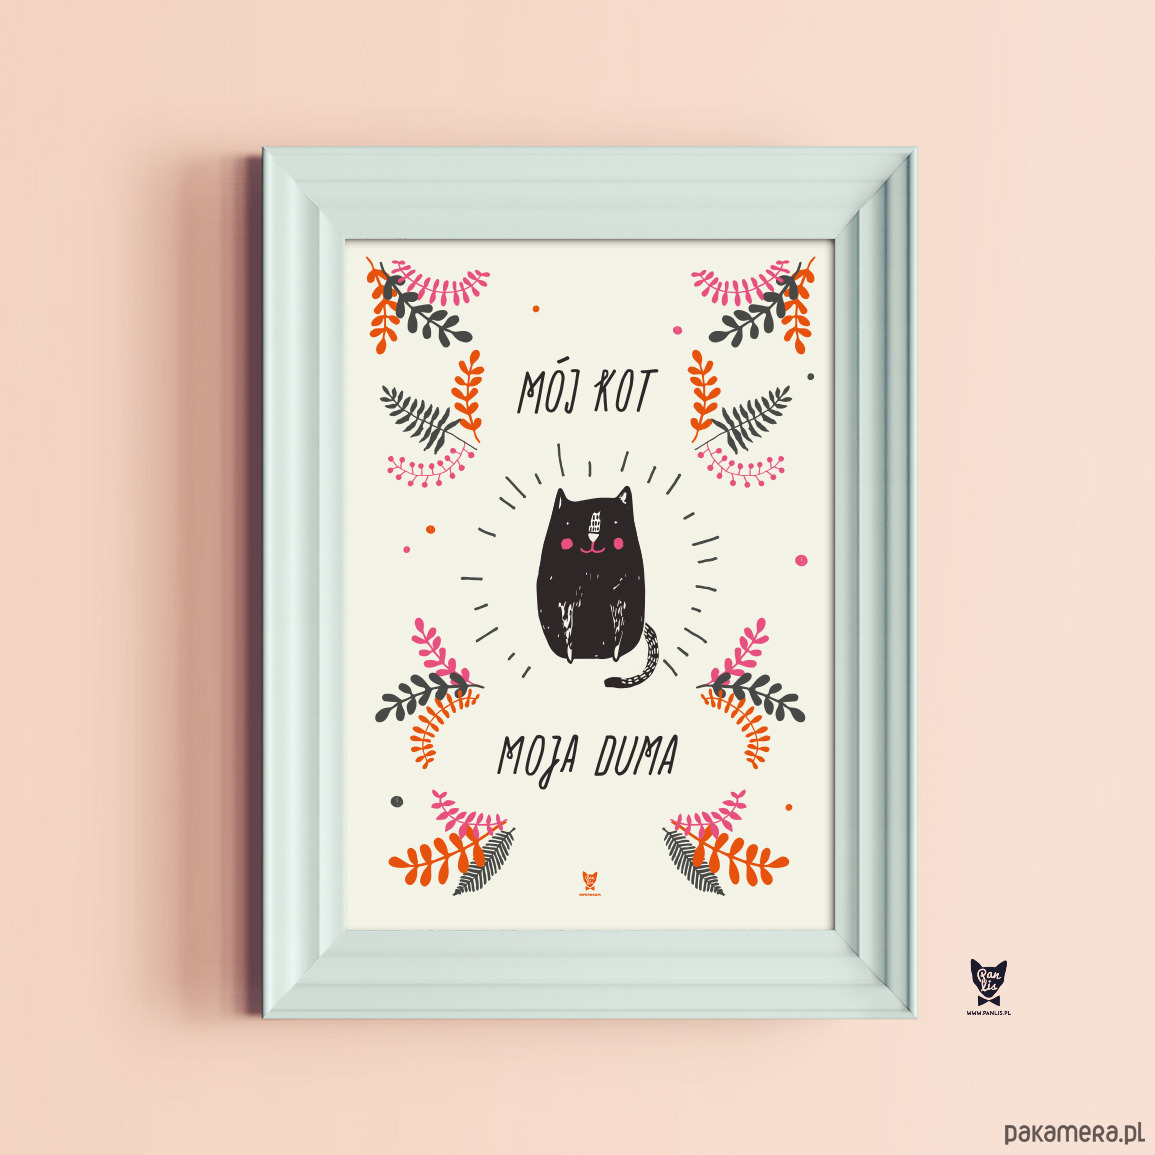 Plakat Dla Kociarzy Mój Kot Moja Duma A2 Pakamerapl